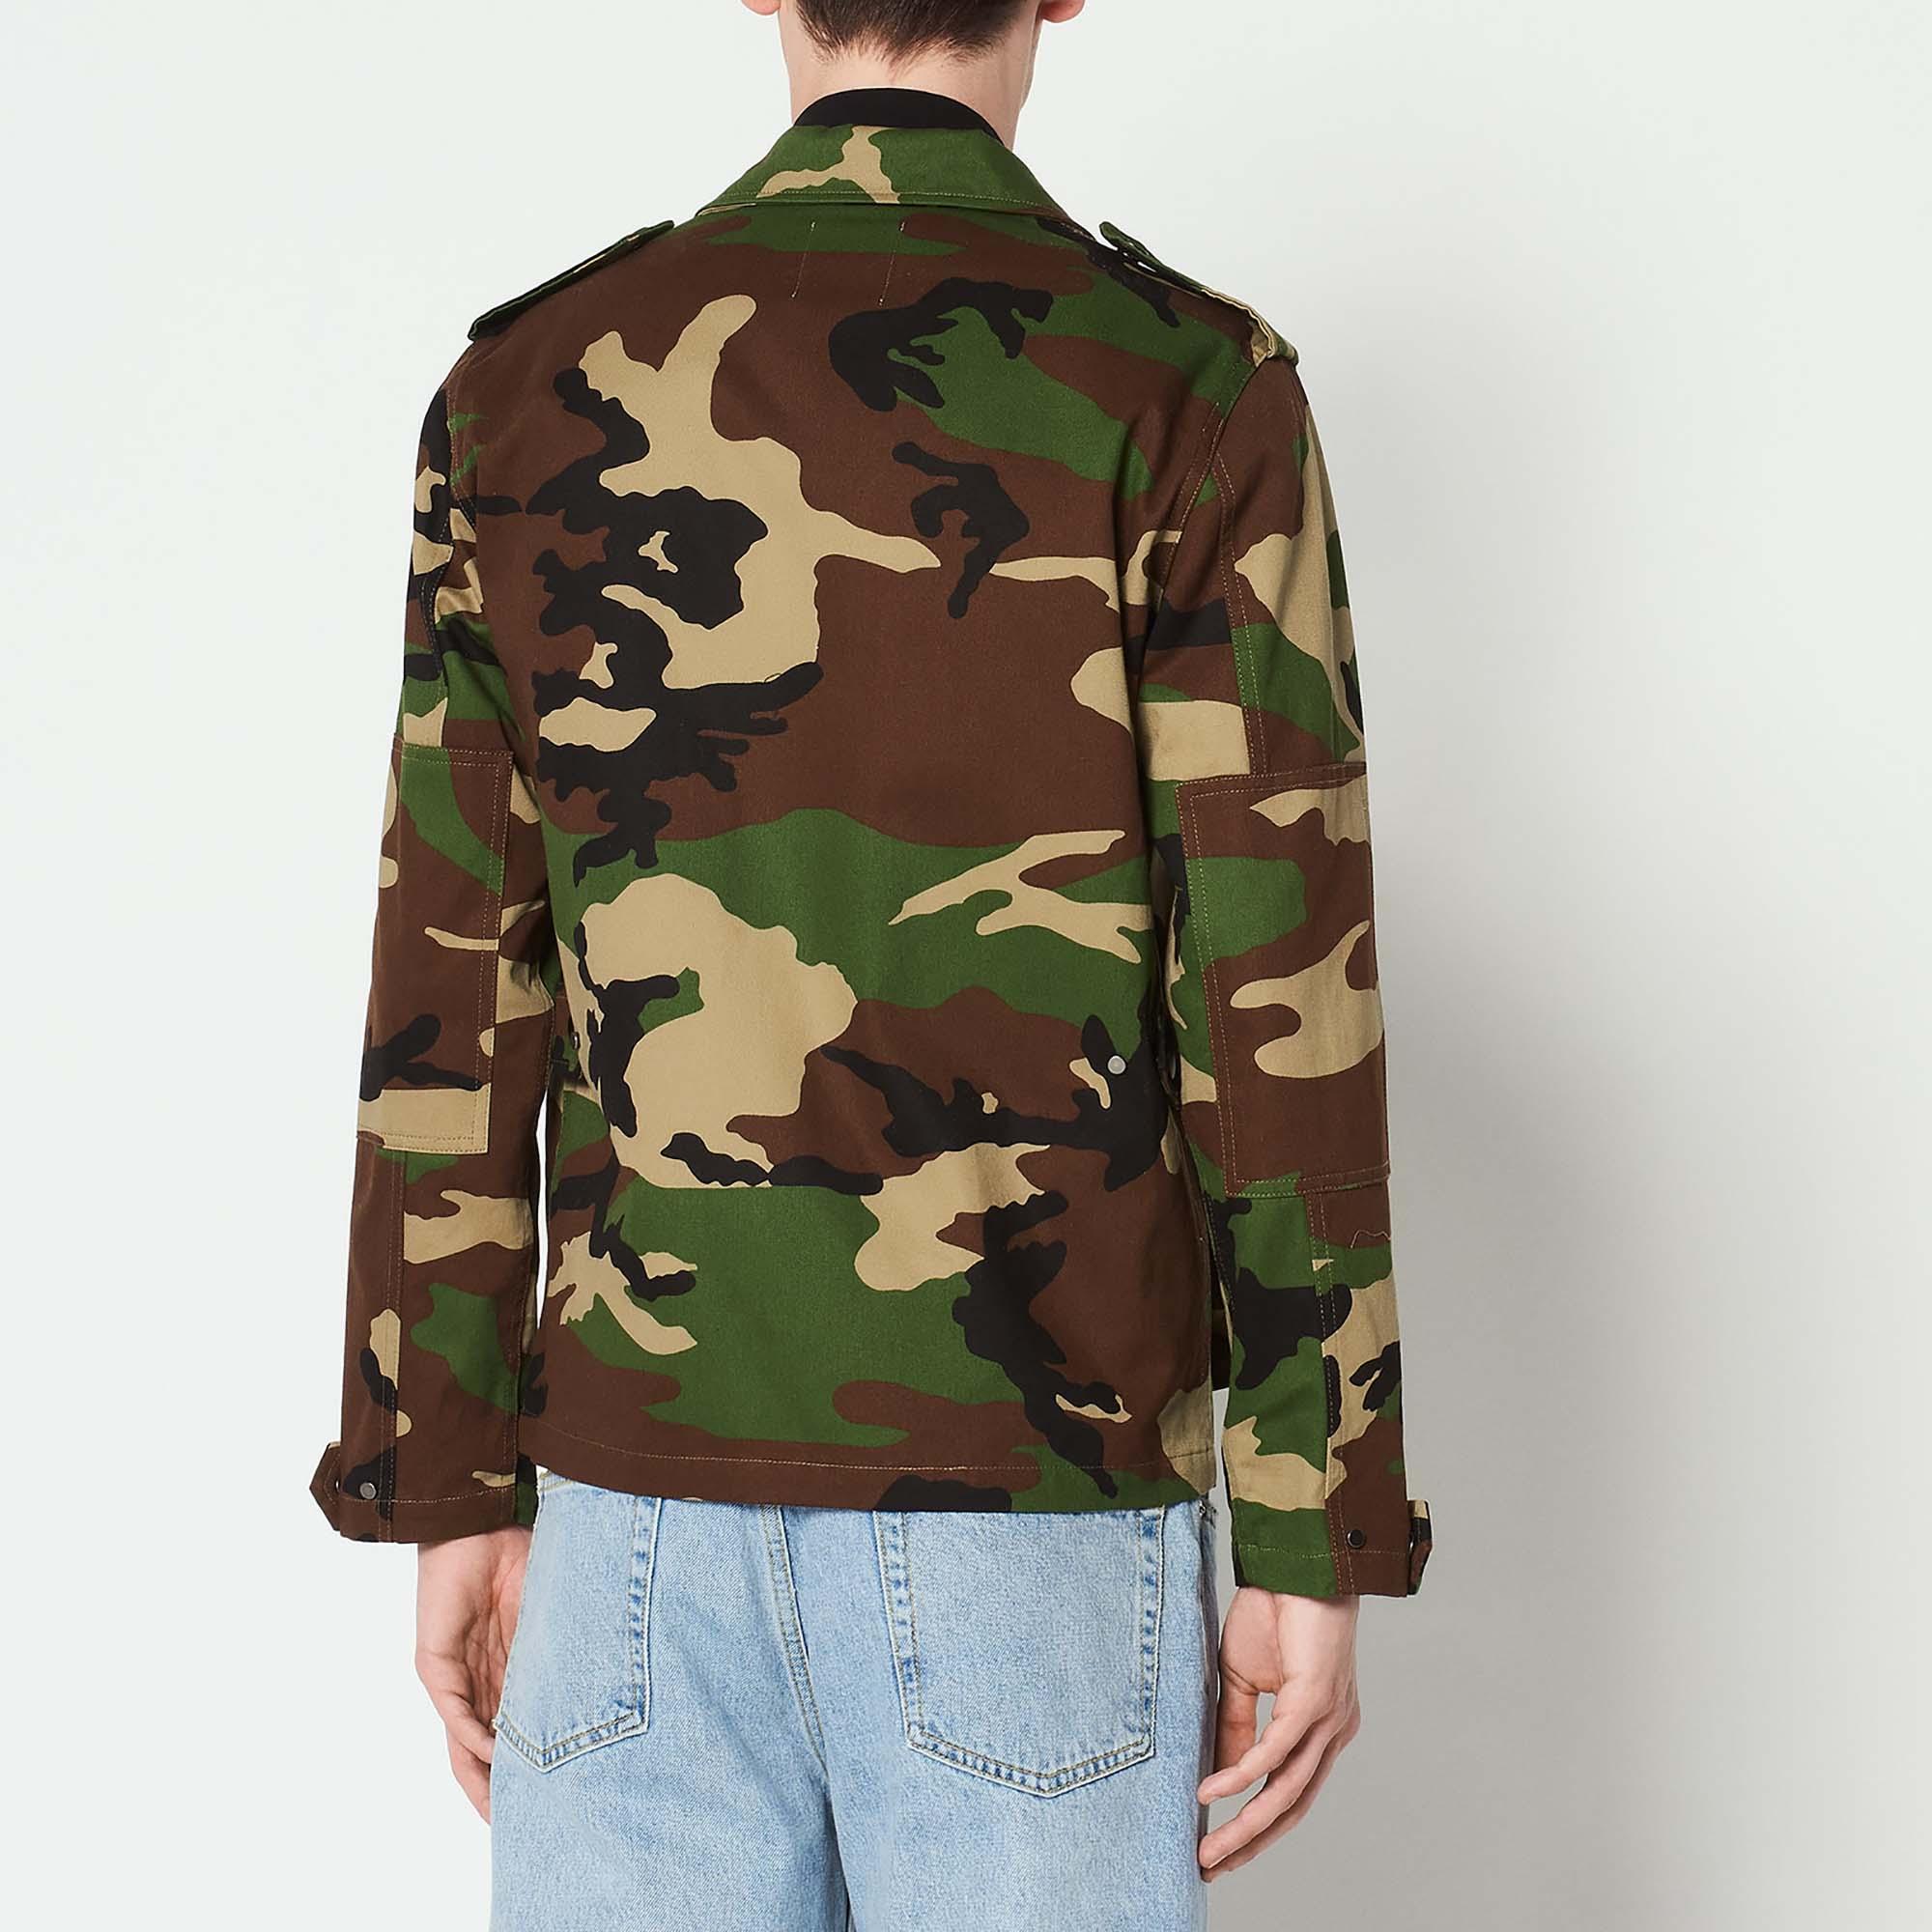 5da822d2 ... Camouflage print jacket : Coats & Jackets color Olive Green ...